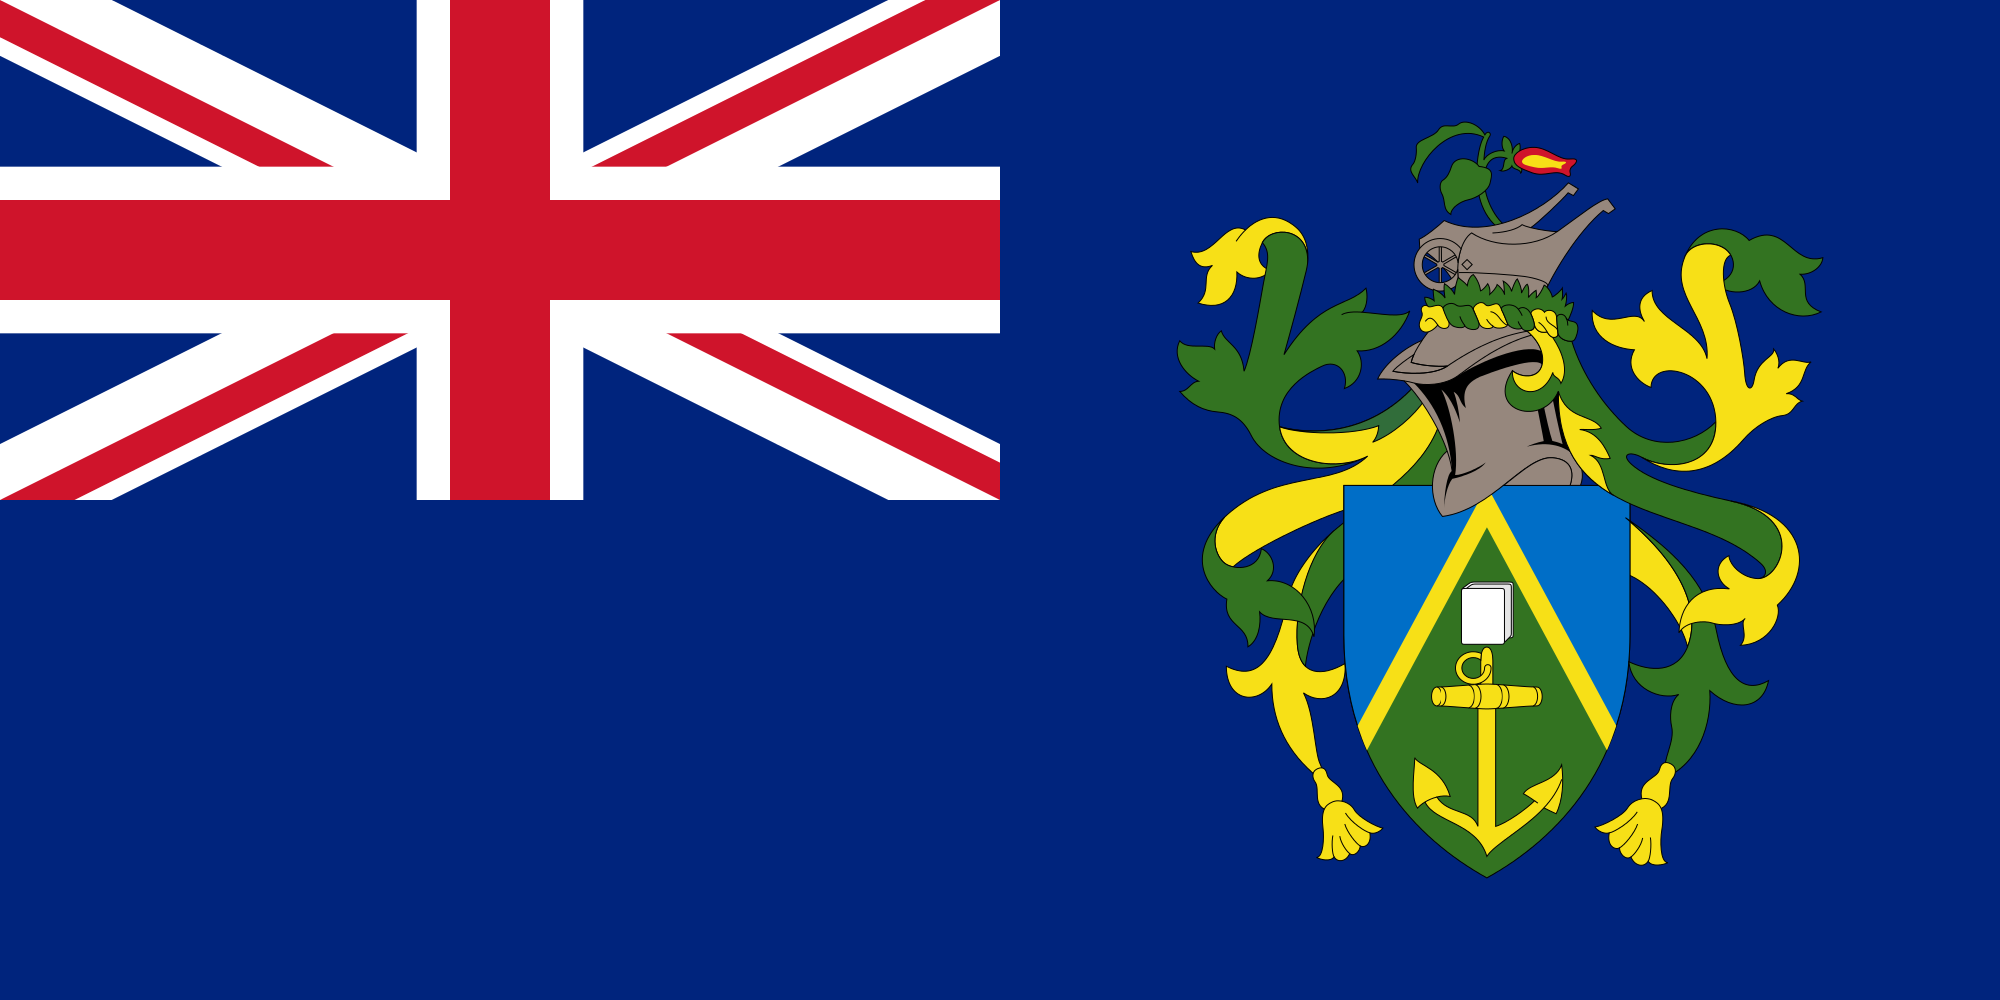 islas pitcairn, Land, Emblem, Logo, Symbol - Wallpaper HD - Prof.-falken.com